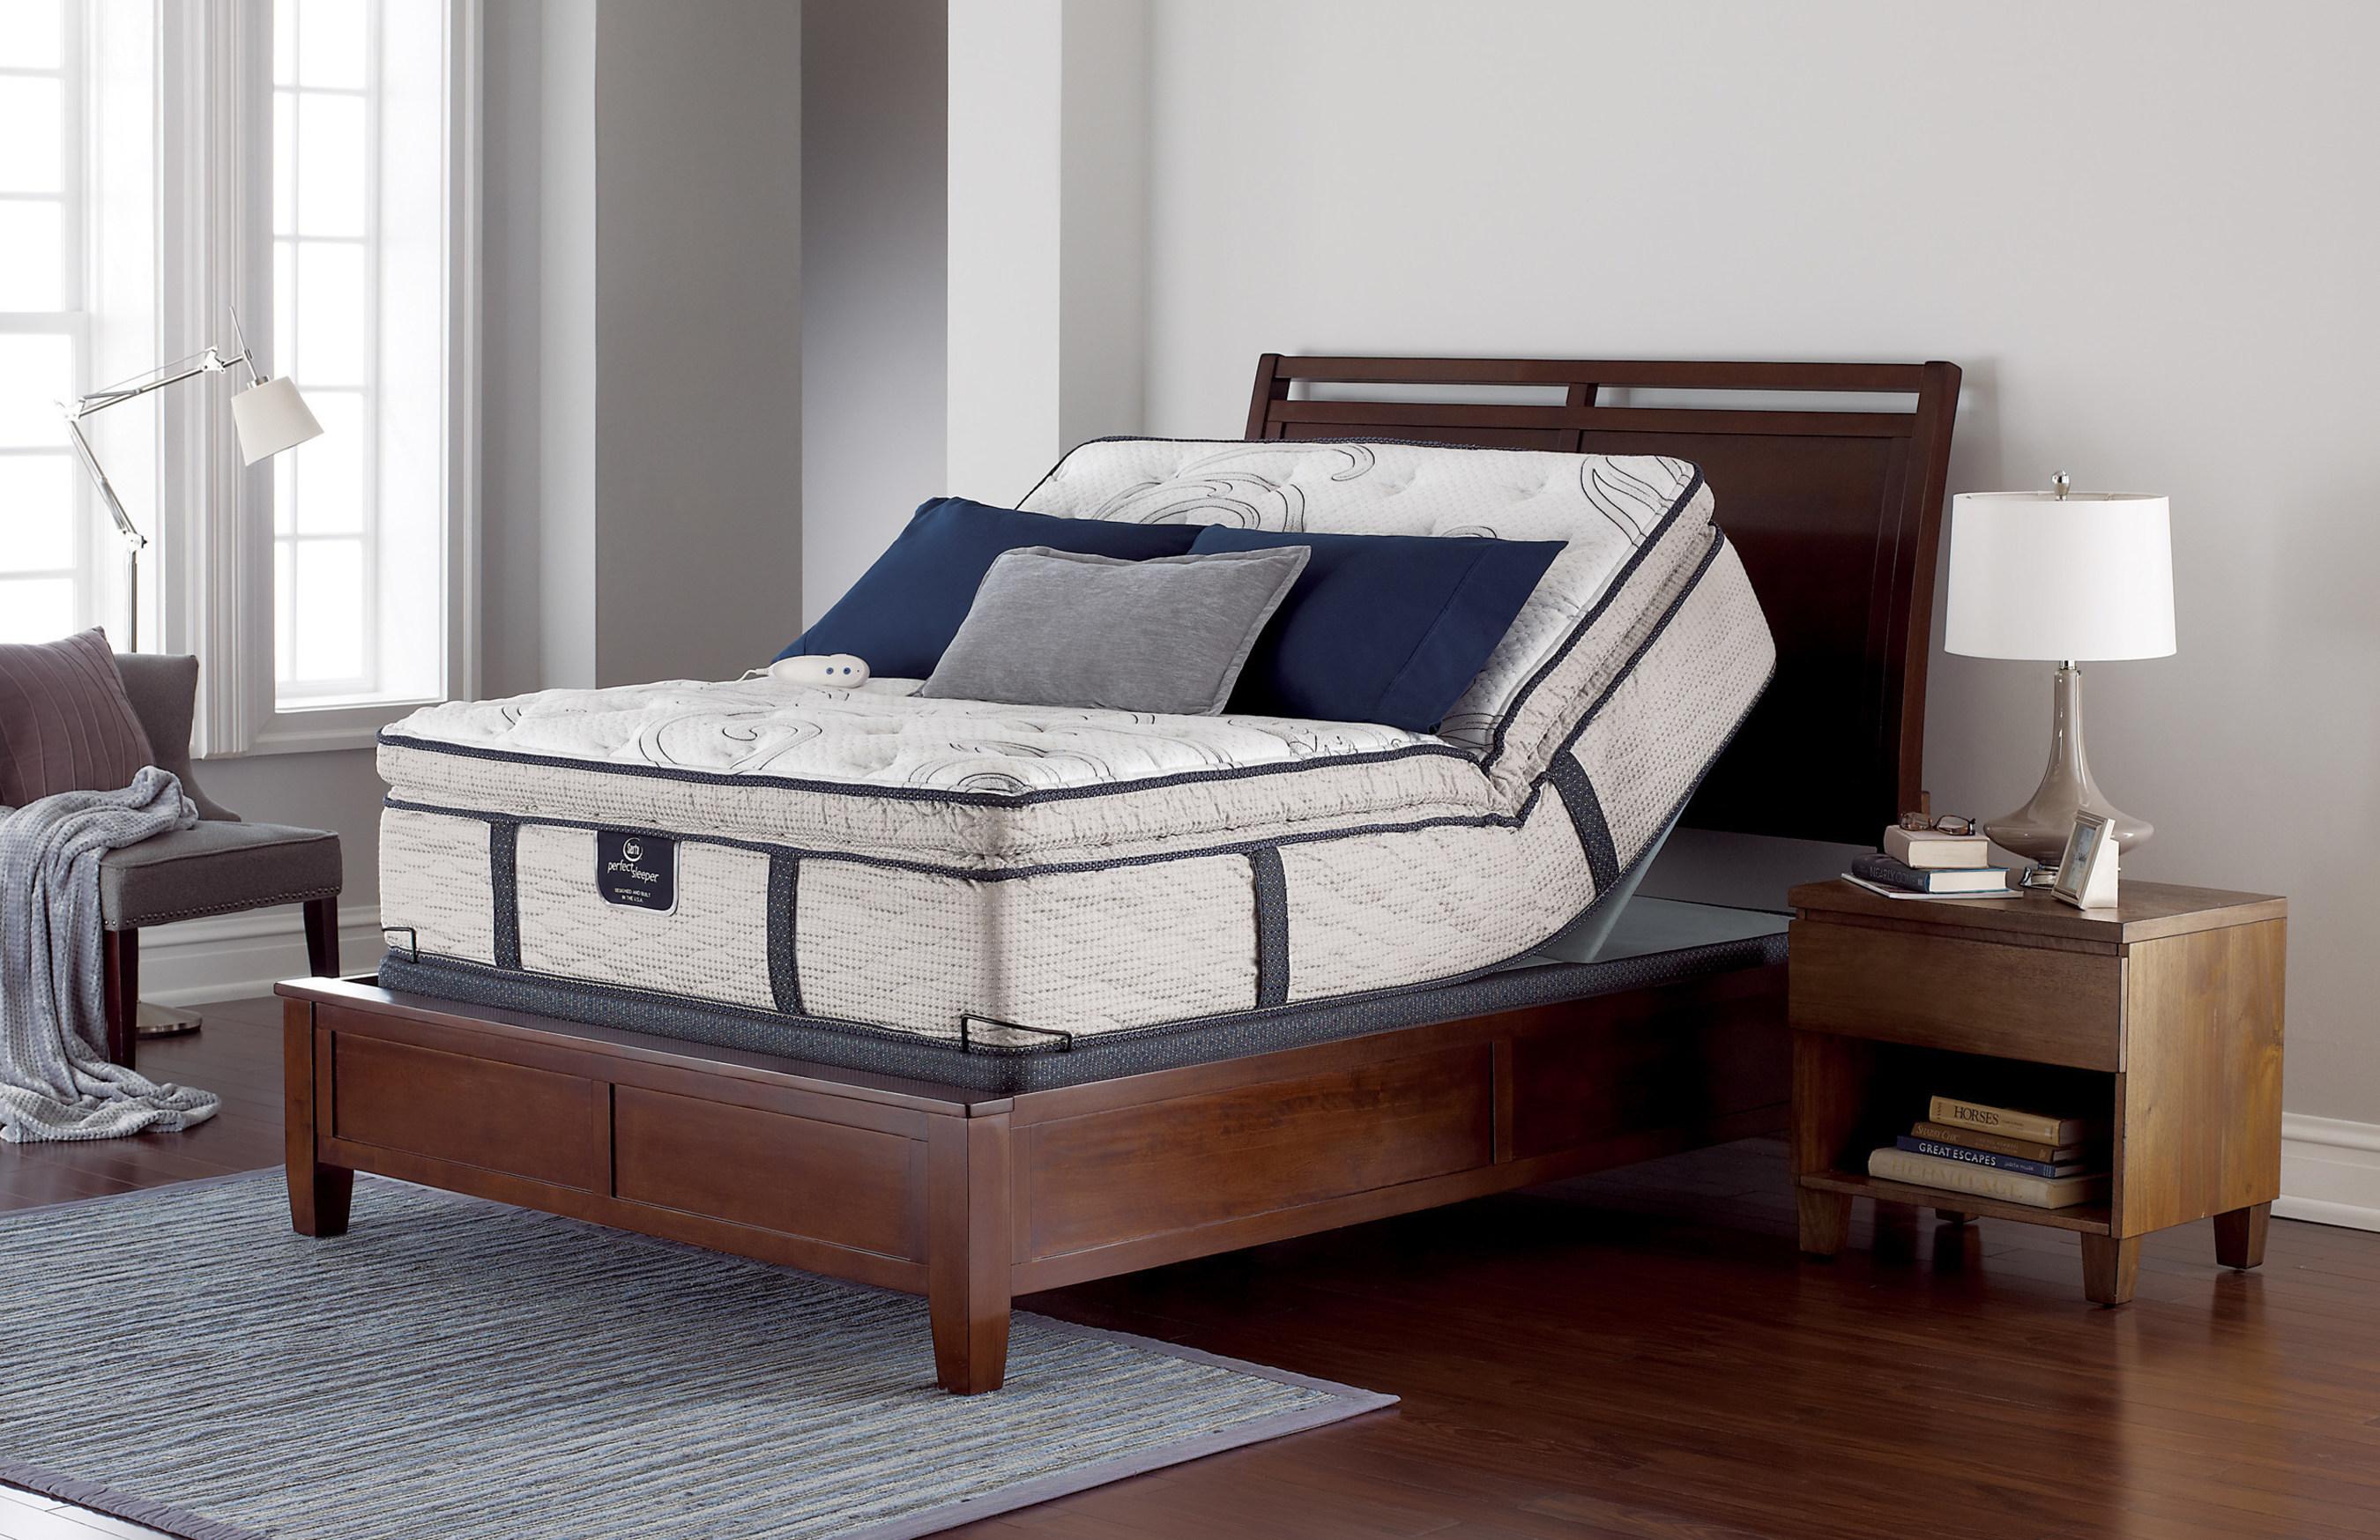 New Serta Perfect Sleeper Designed To Address Five Common